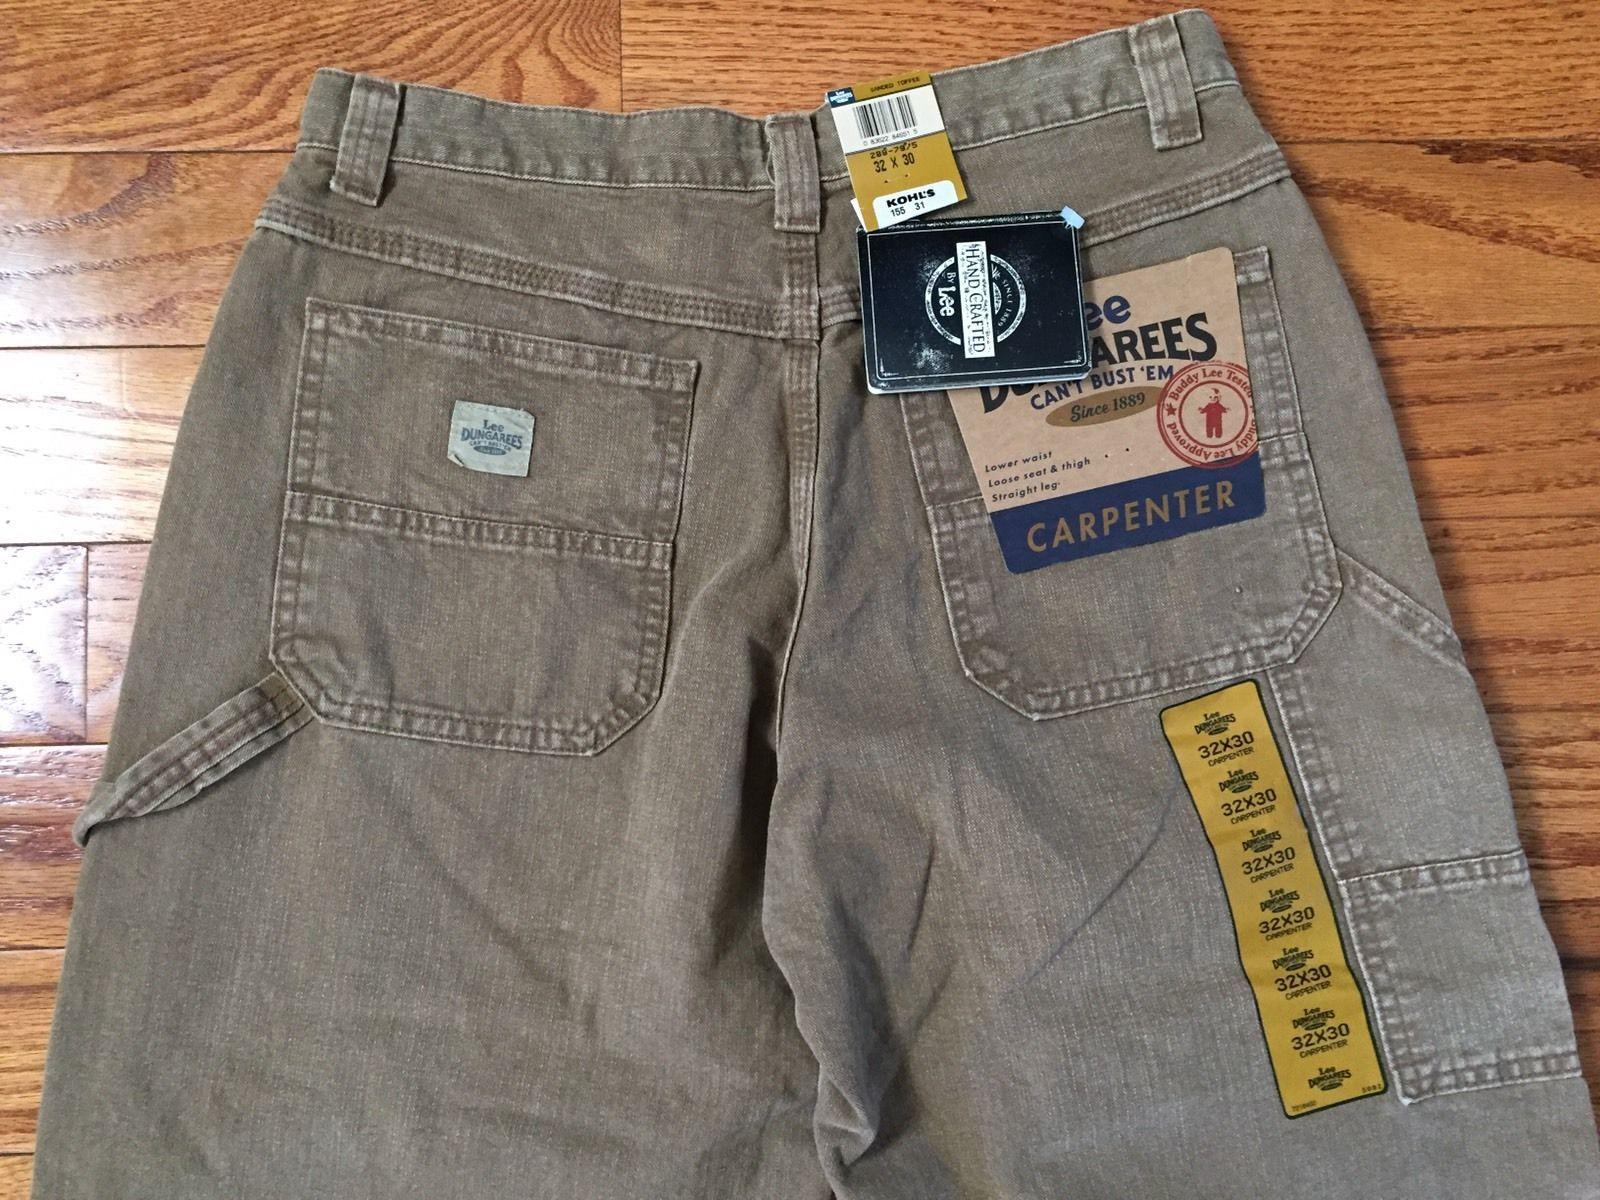 27cb158a NEW Mens Lee Dungarees Carpenter Jeans Pants Straight Leg Brown Tan 32 x 30